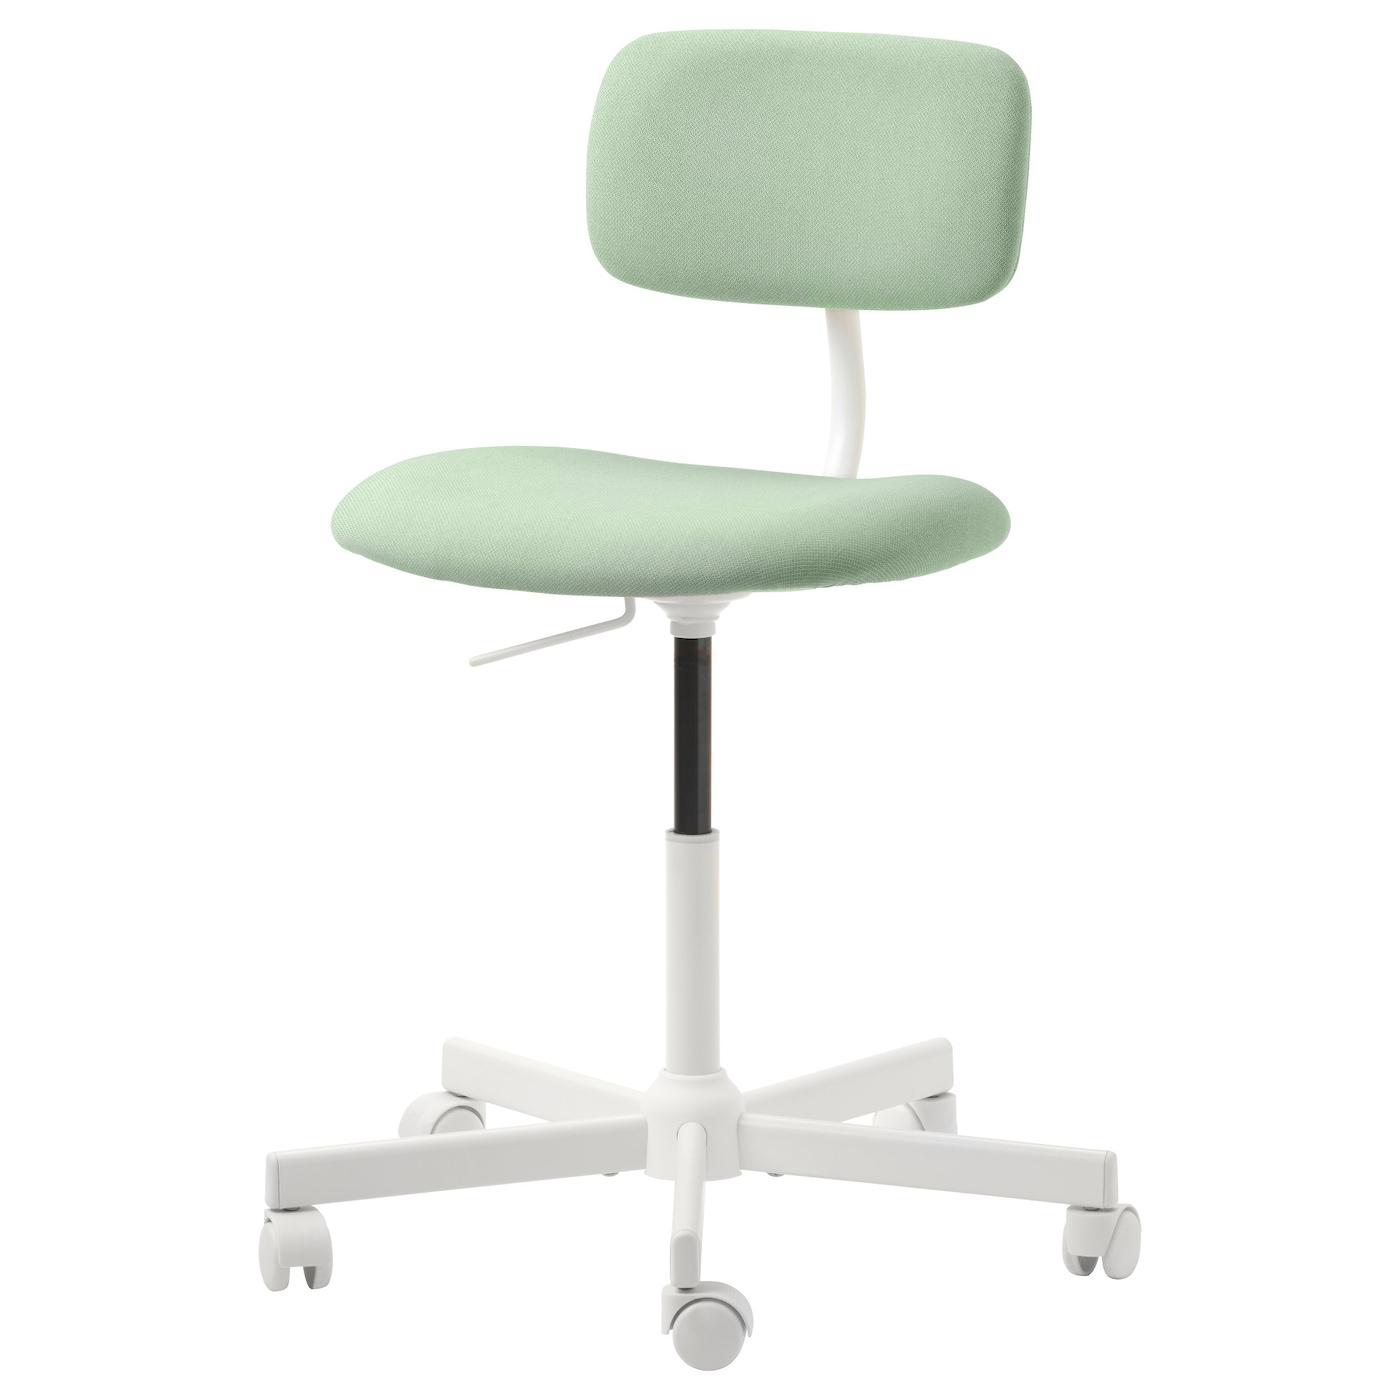 bleckberget chaise pivotante idekulla vert clair ikea. Black Bedroom Furniture Sets. Home Design Ideas